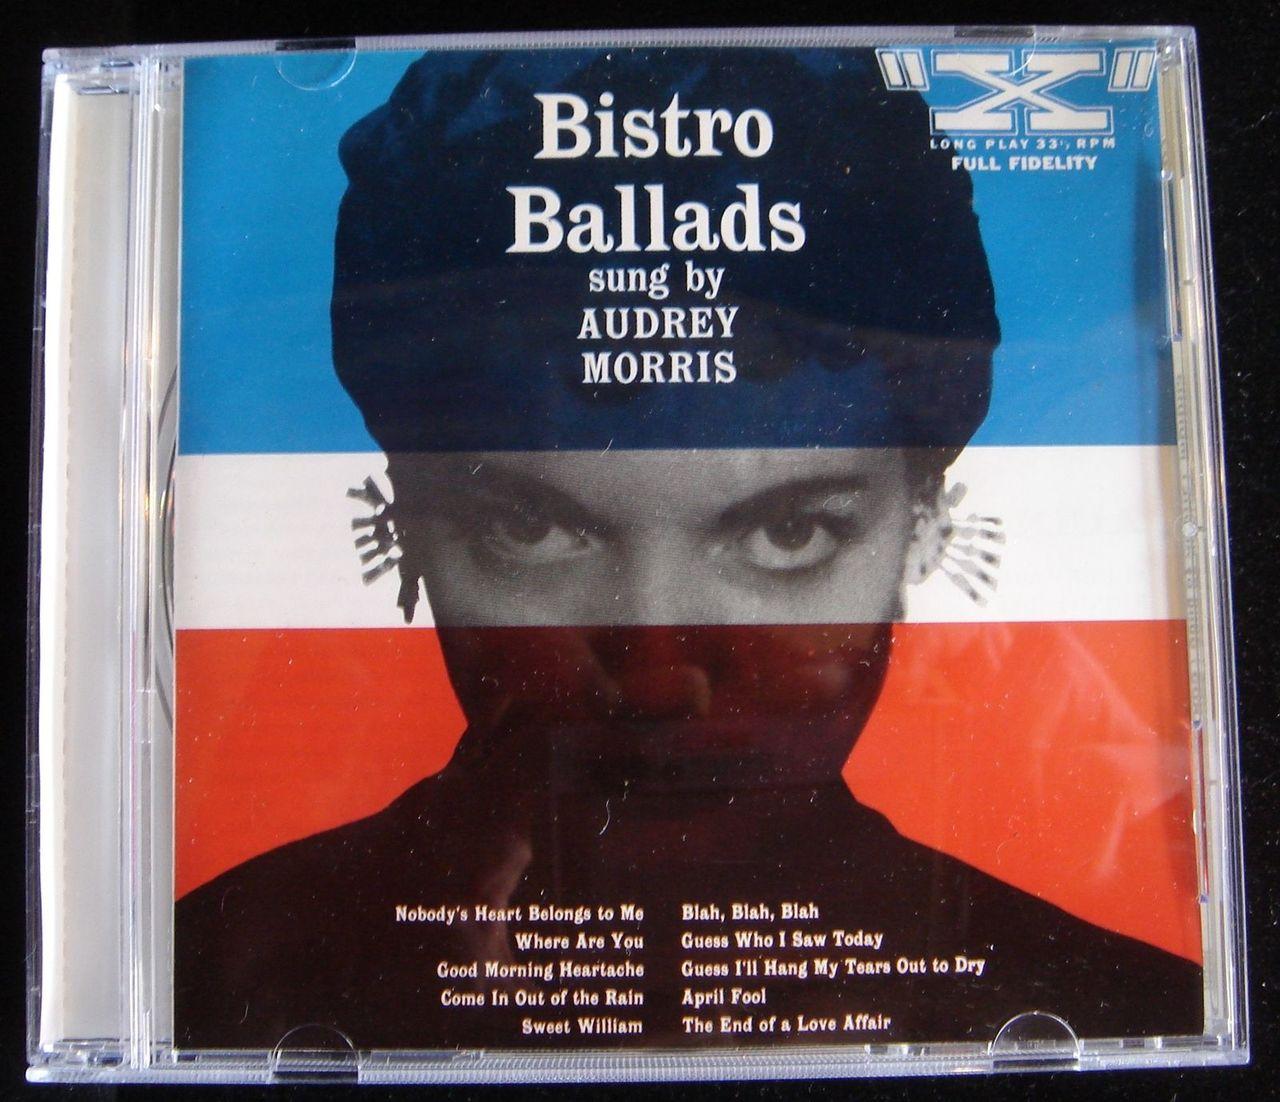 CD: BISTRO BALLADS by Audrey Morris - 1954